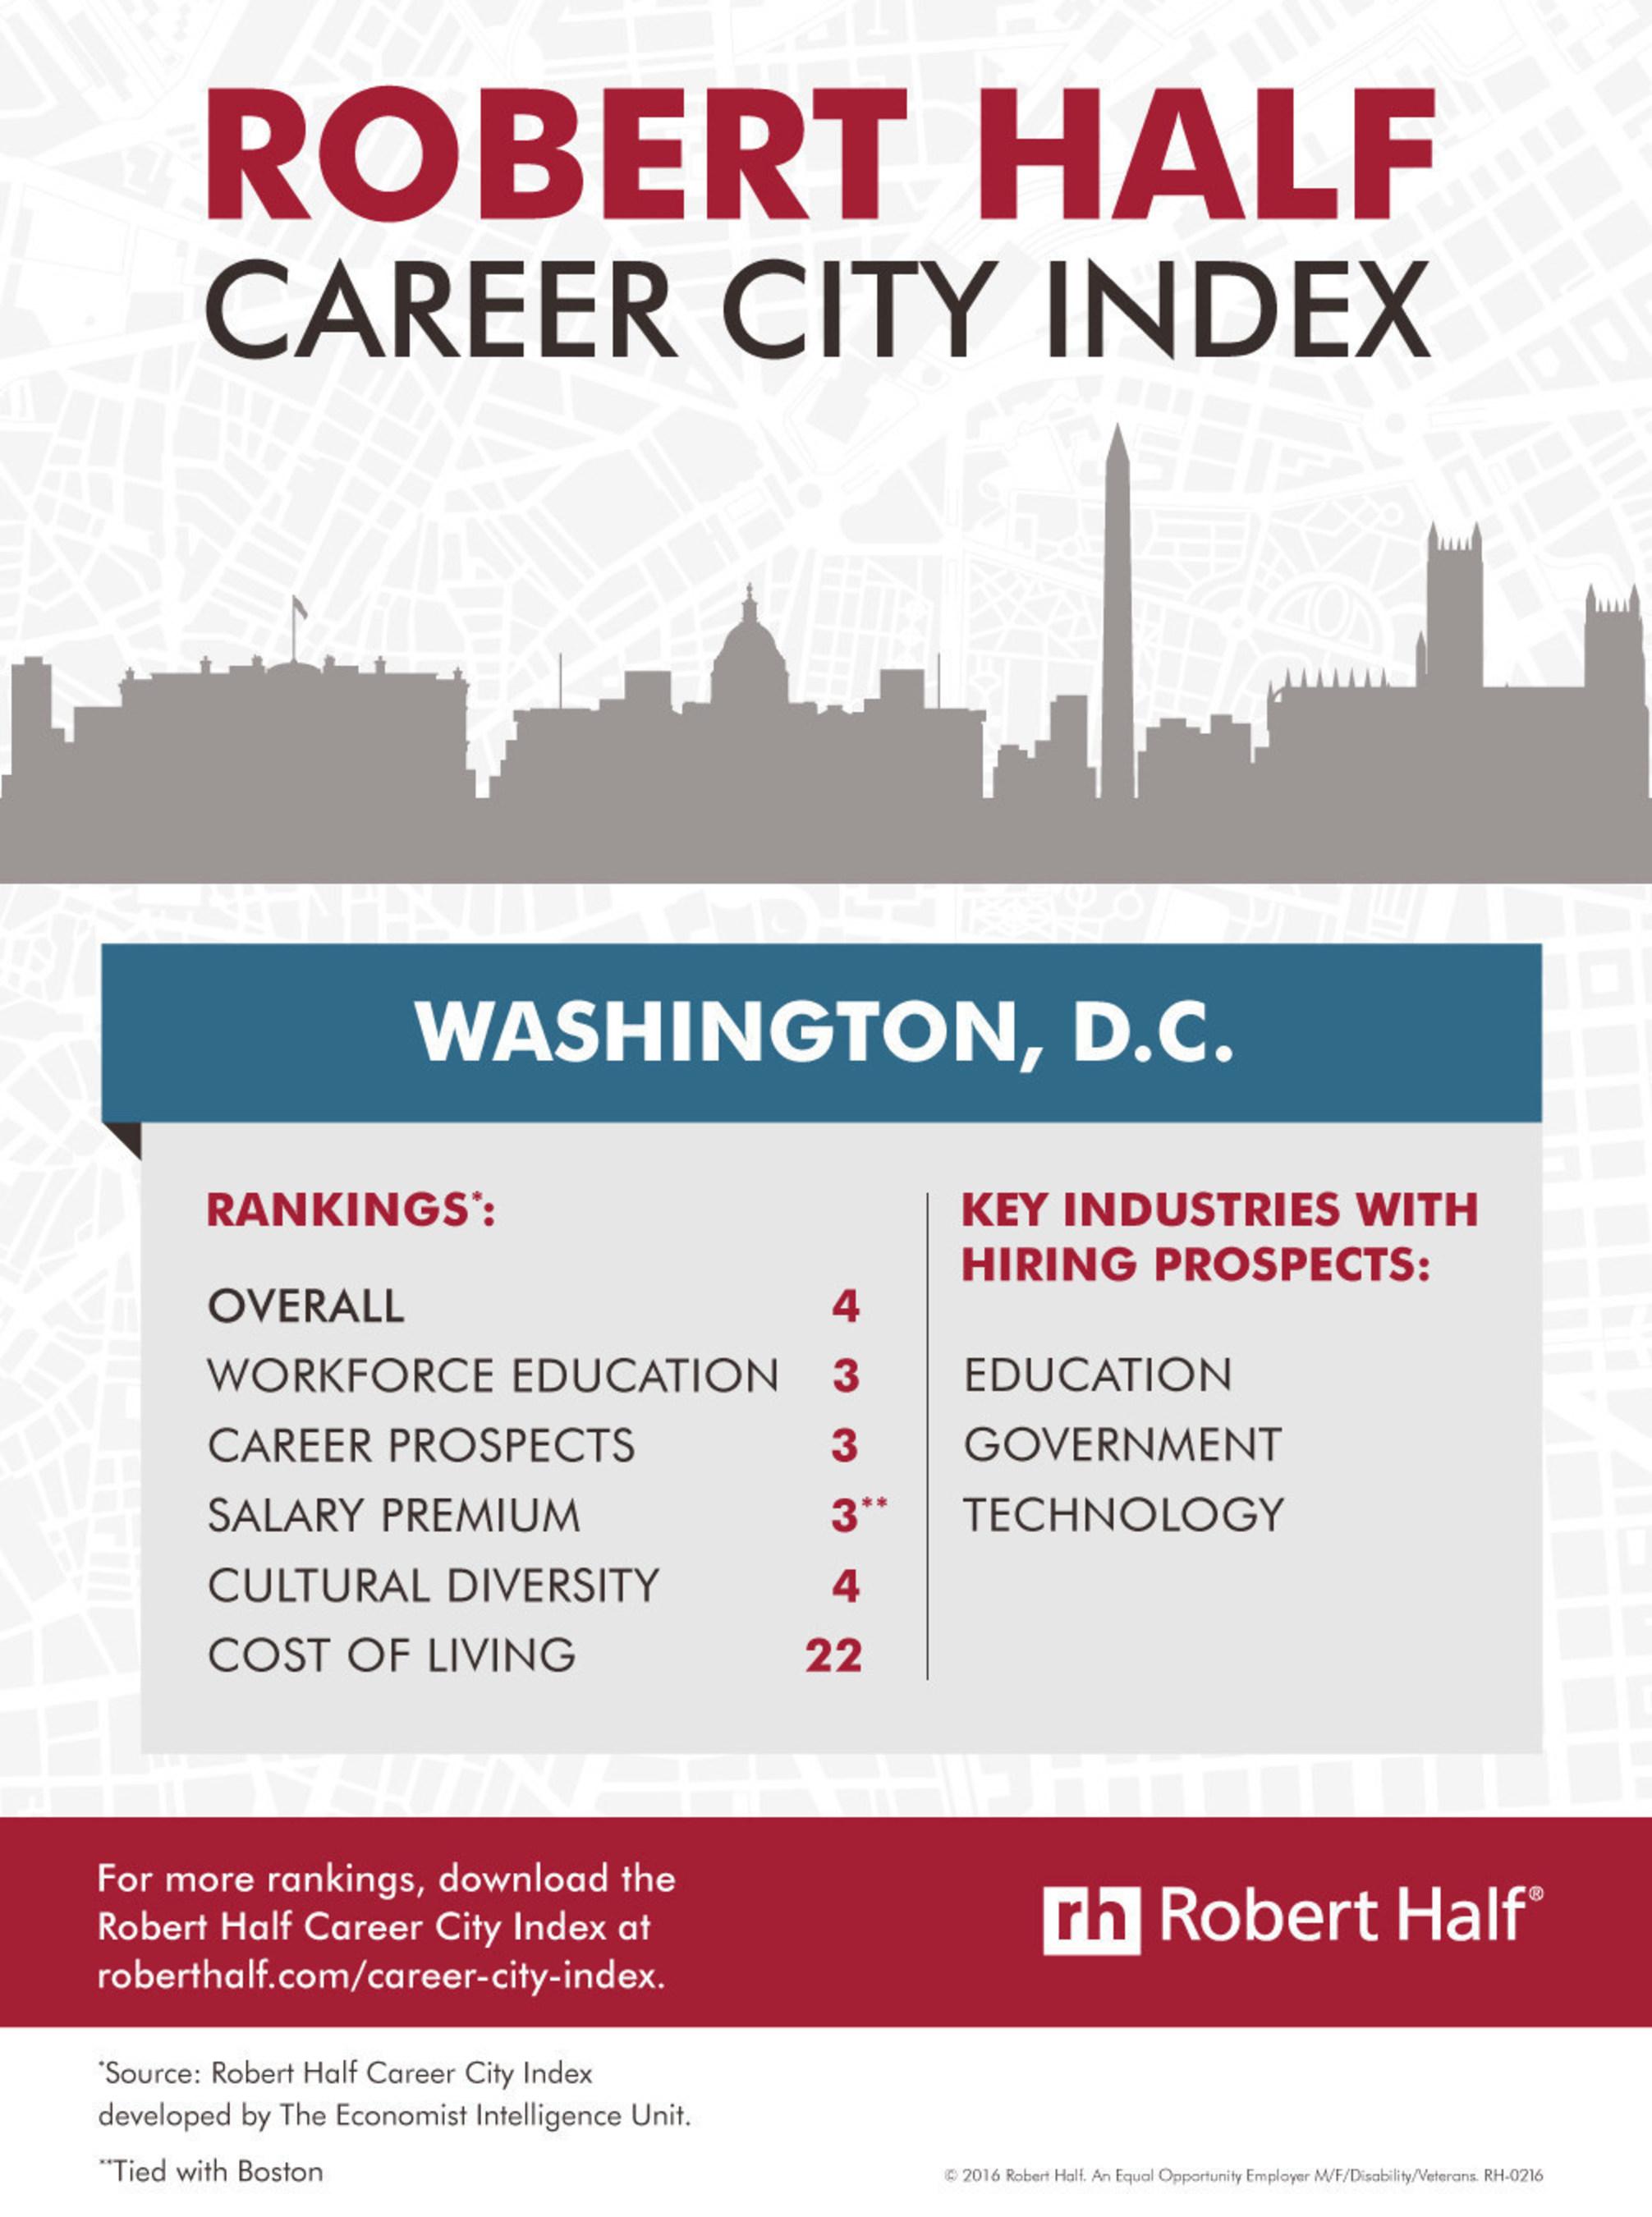 Washington, D.C. Career City Index Rankings